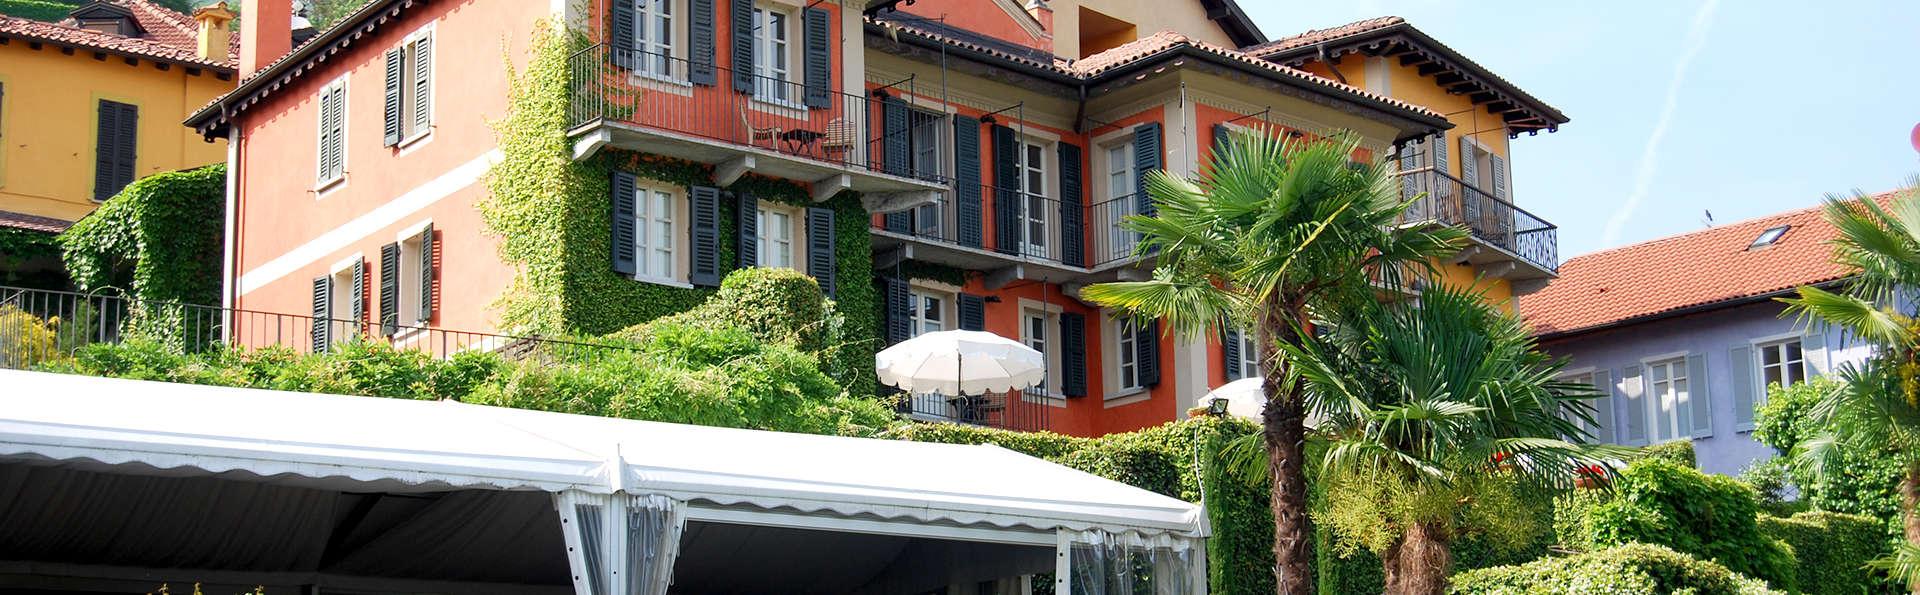 Villa Margherita, The Originals Relais (Relais du Silence) - Edit_Front3.jpg